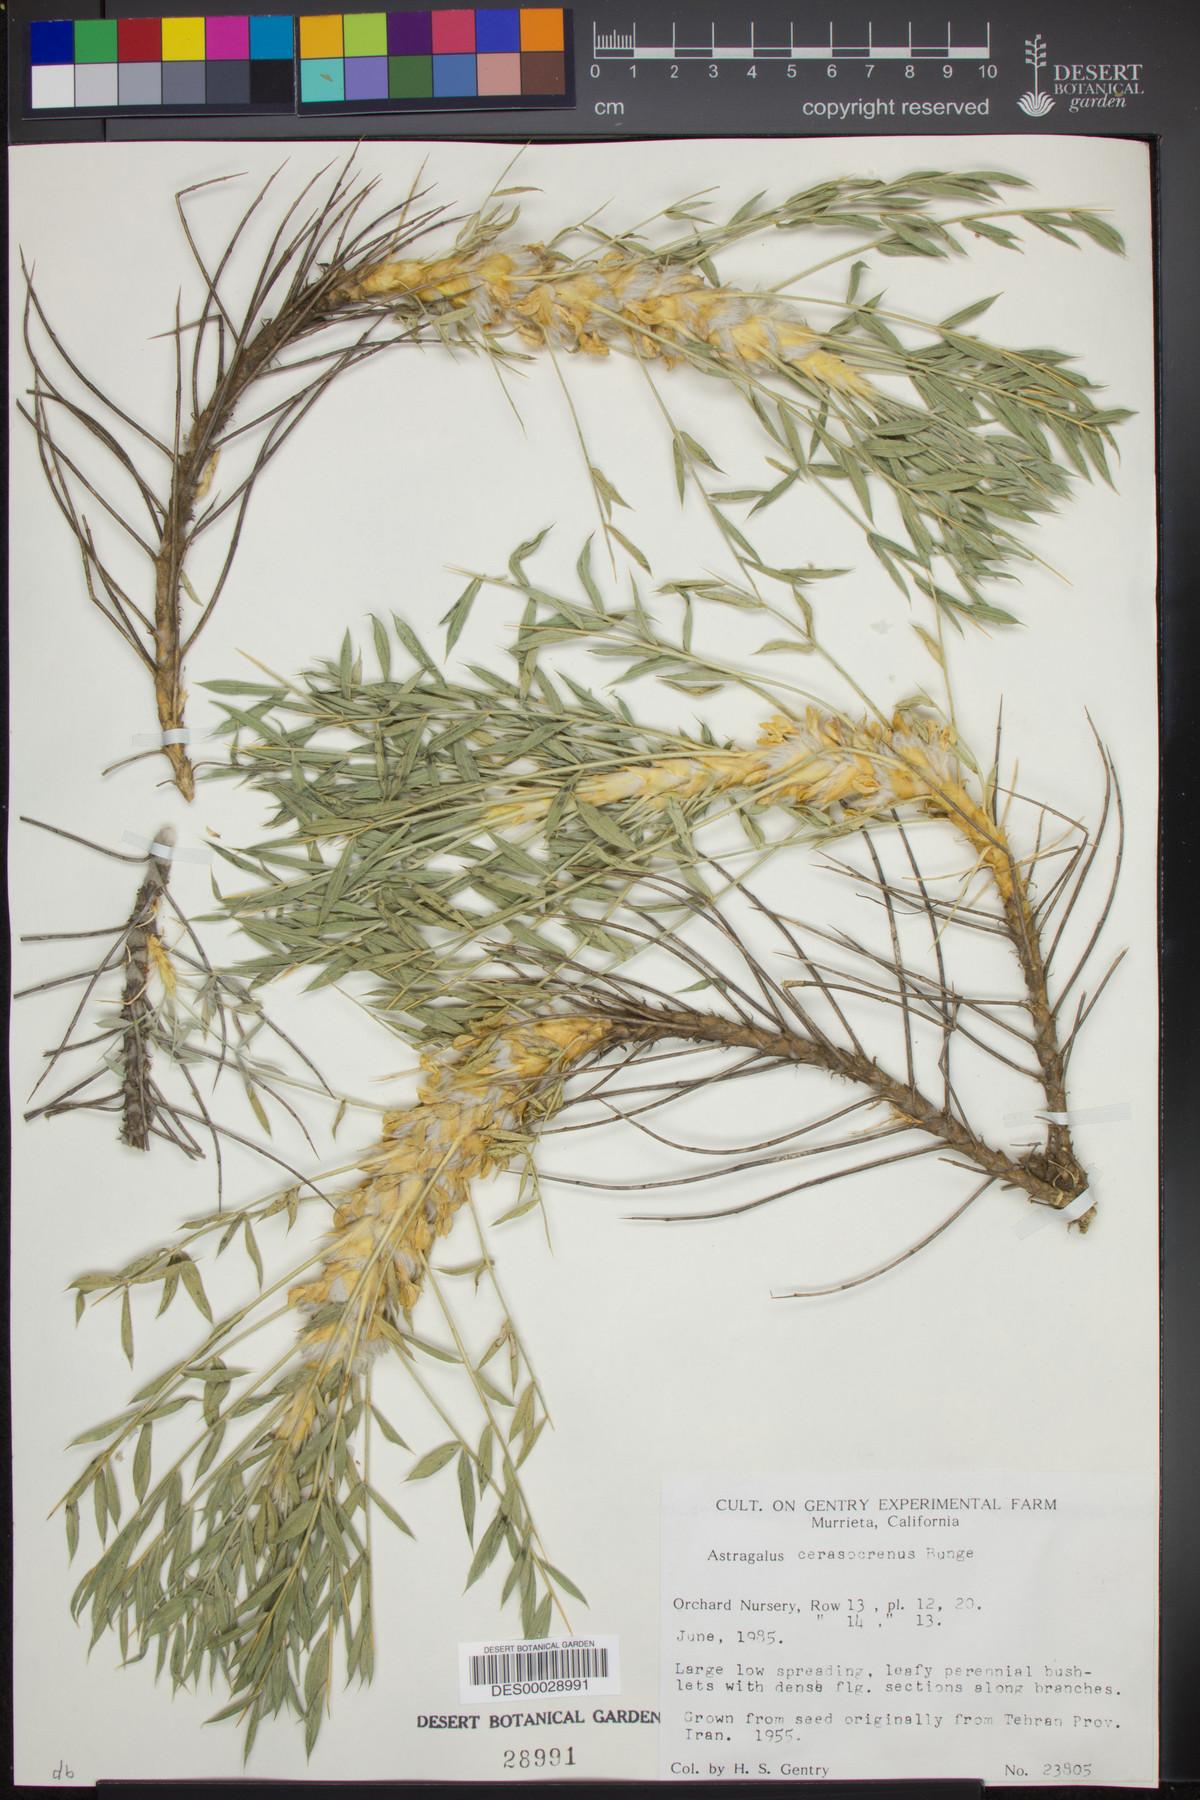 Astragalus cerasocrenus image